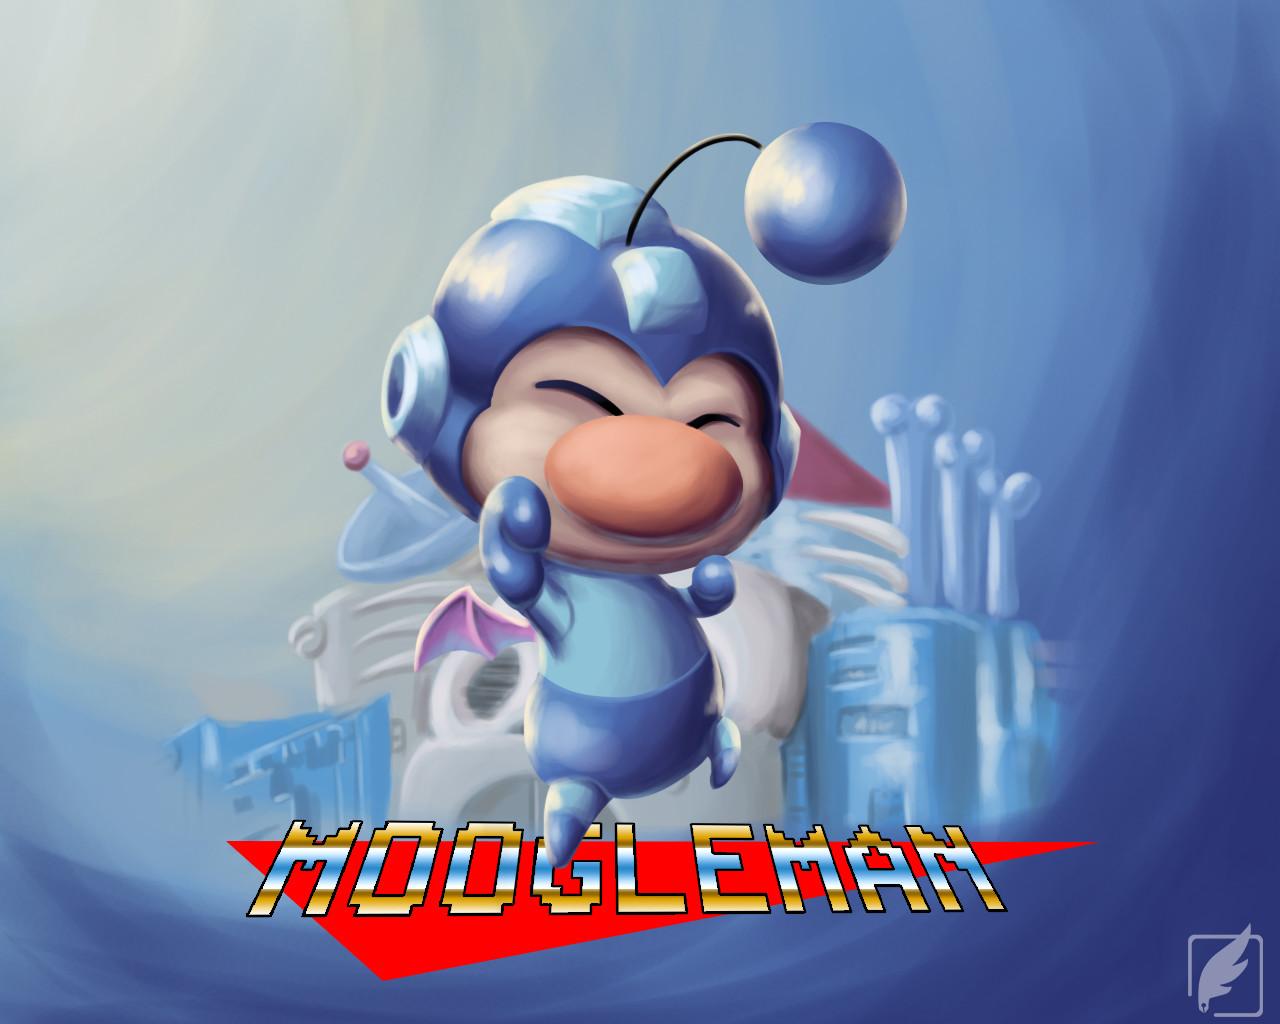 Moogleman